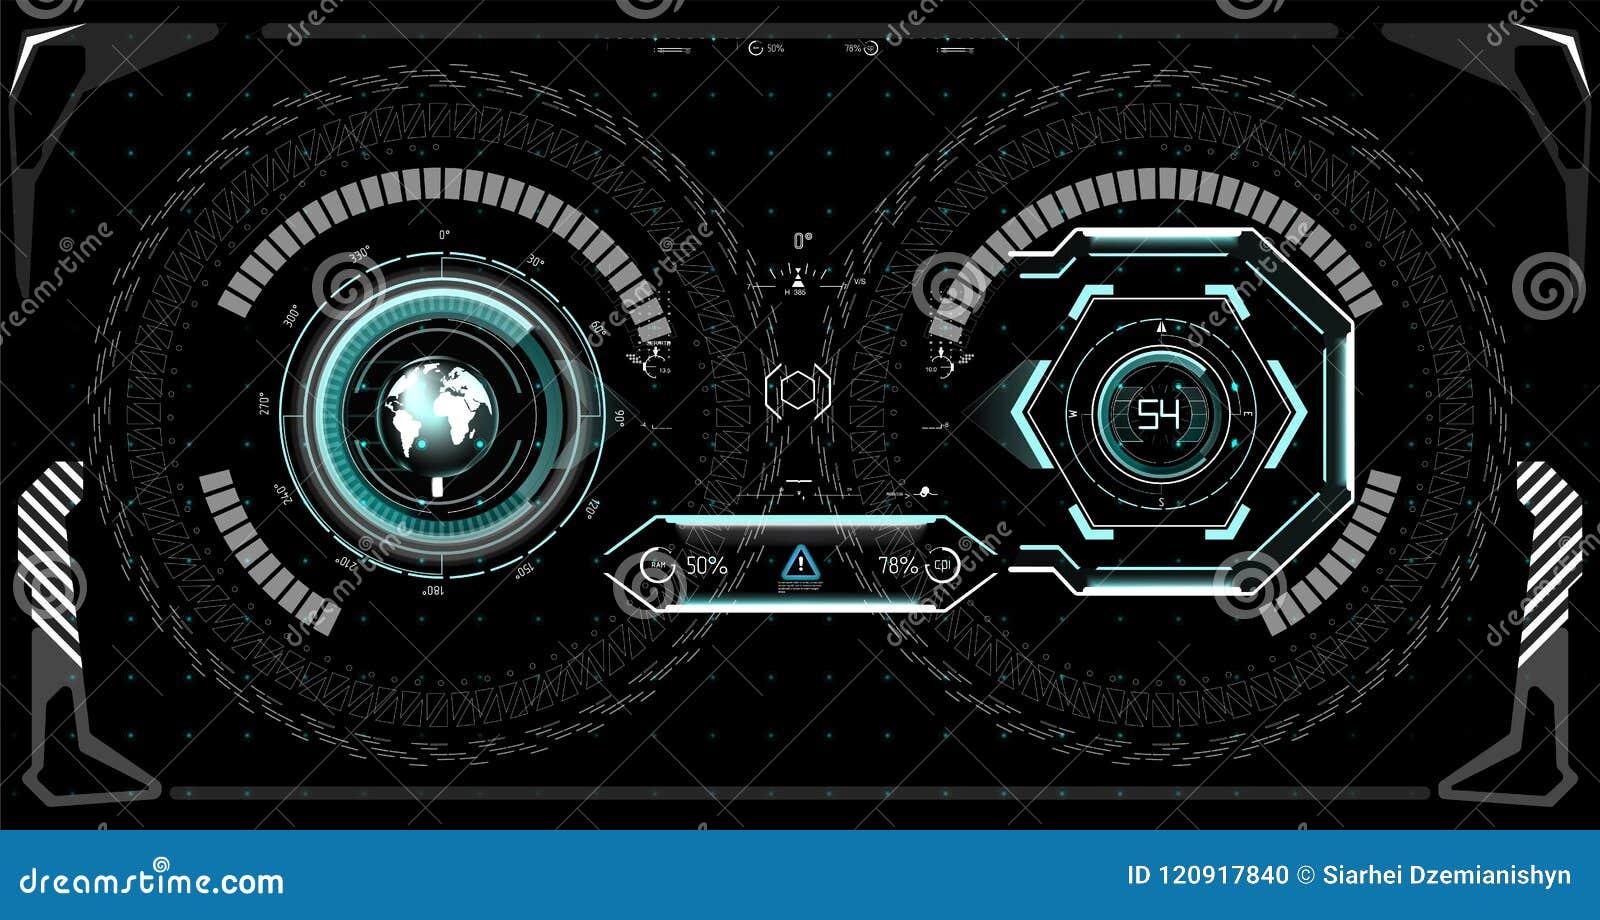 Futuristic Technology HUD Screen  Tactical View Sci-Fi VR Dislpay